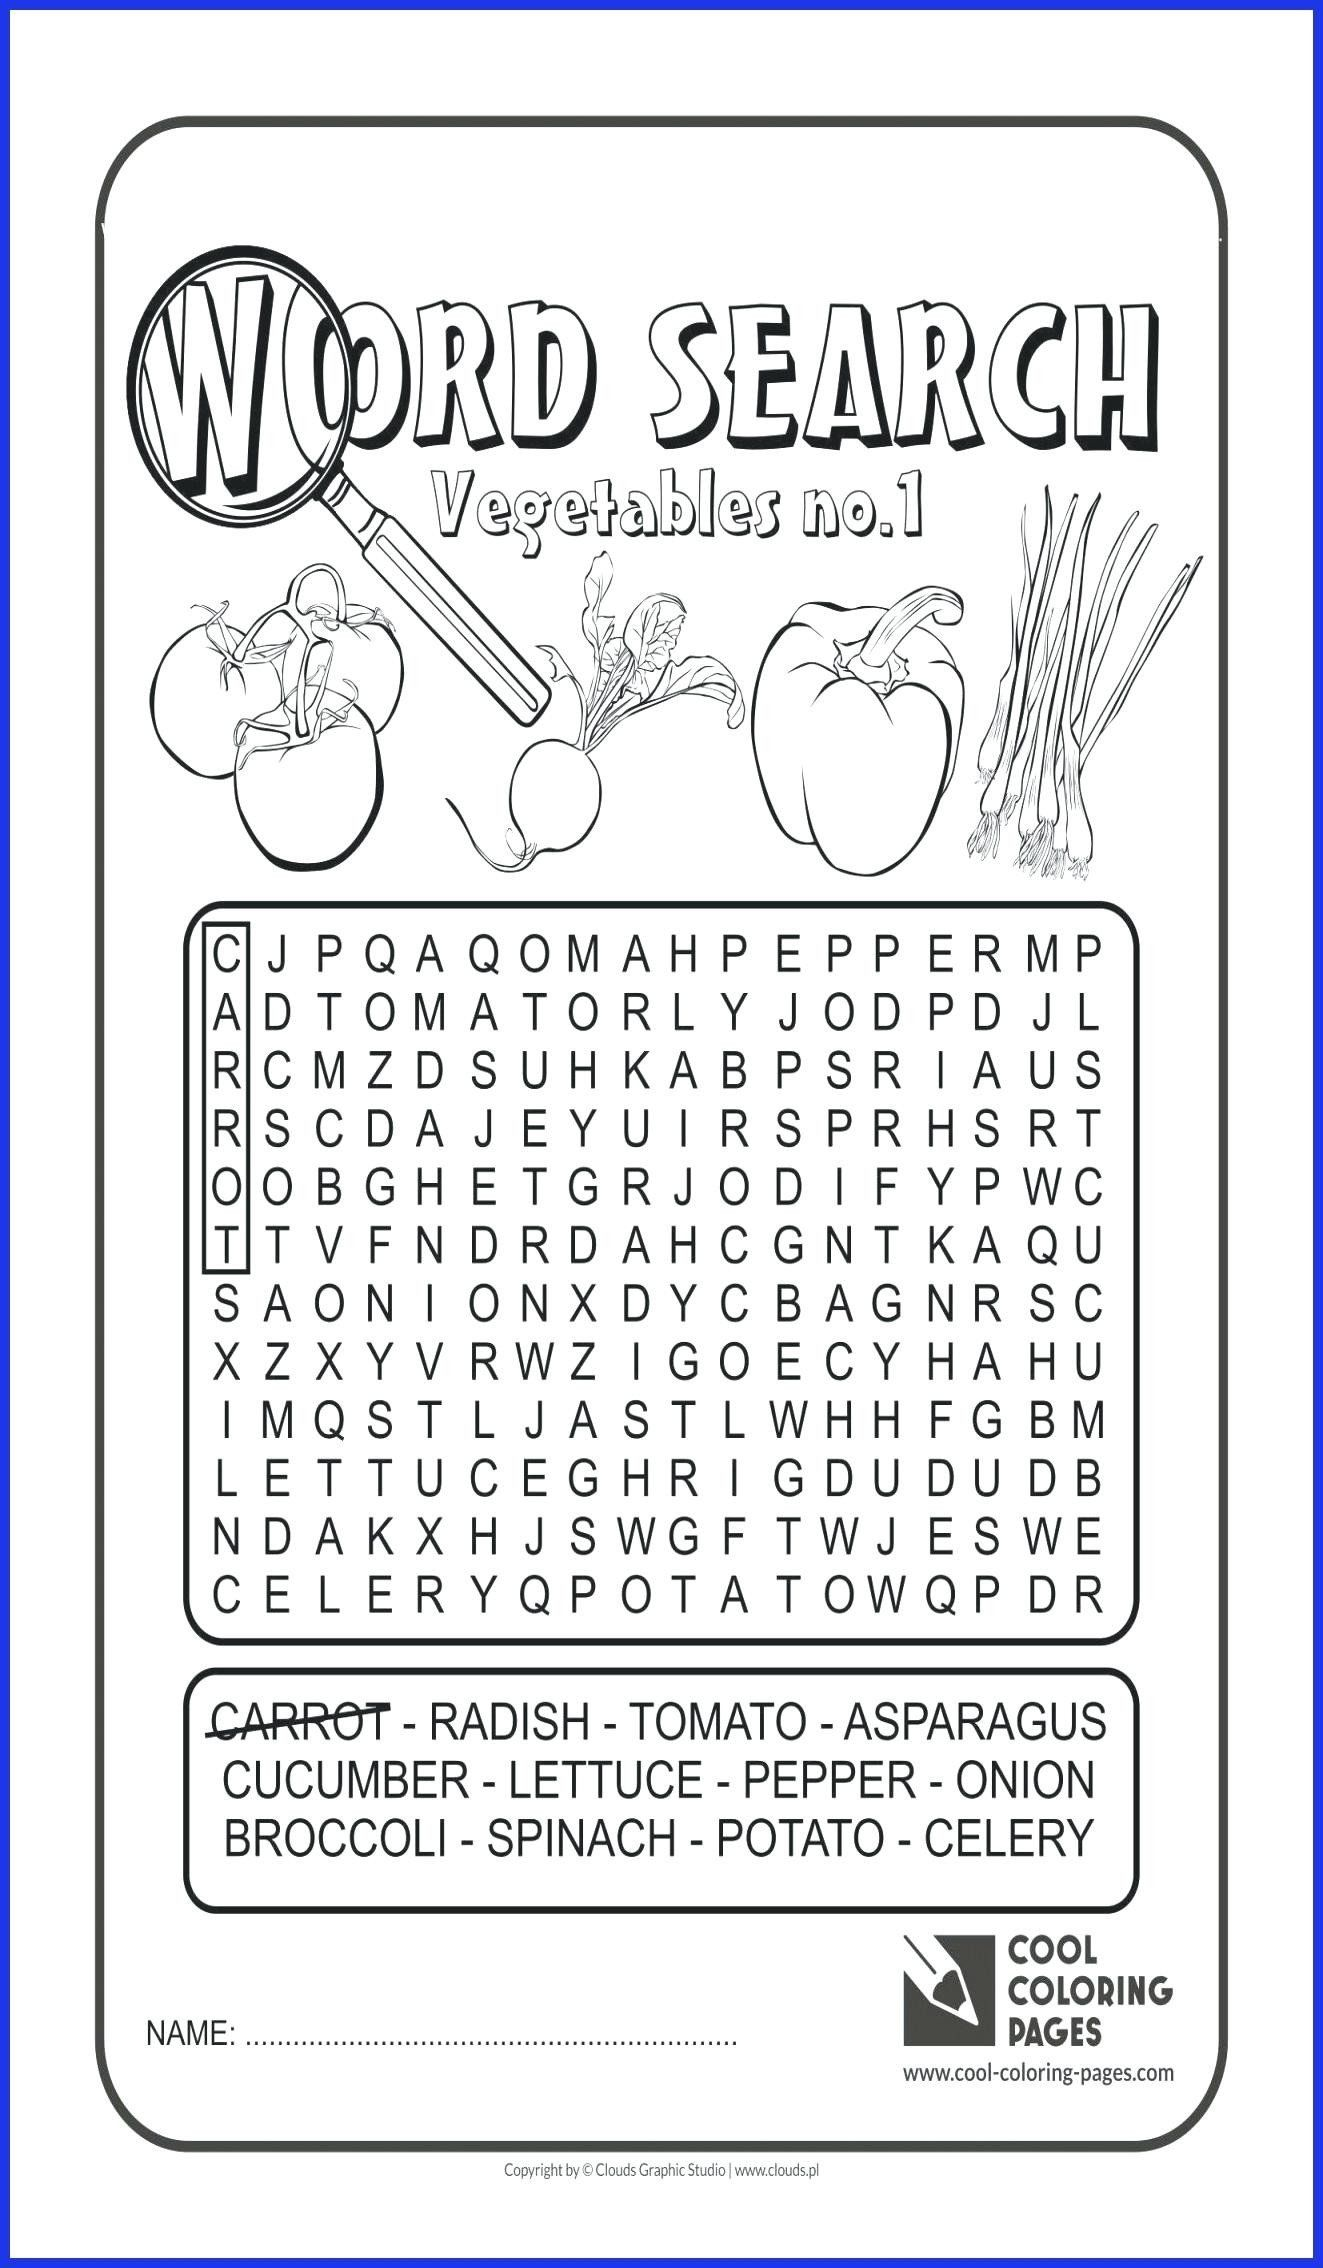 Celery Night Fever Coloring Pages Activites Veggietales Com